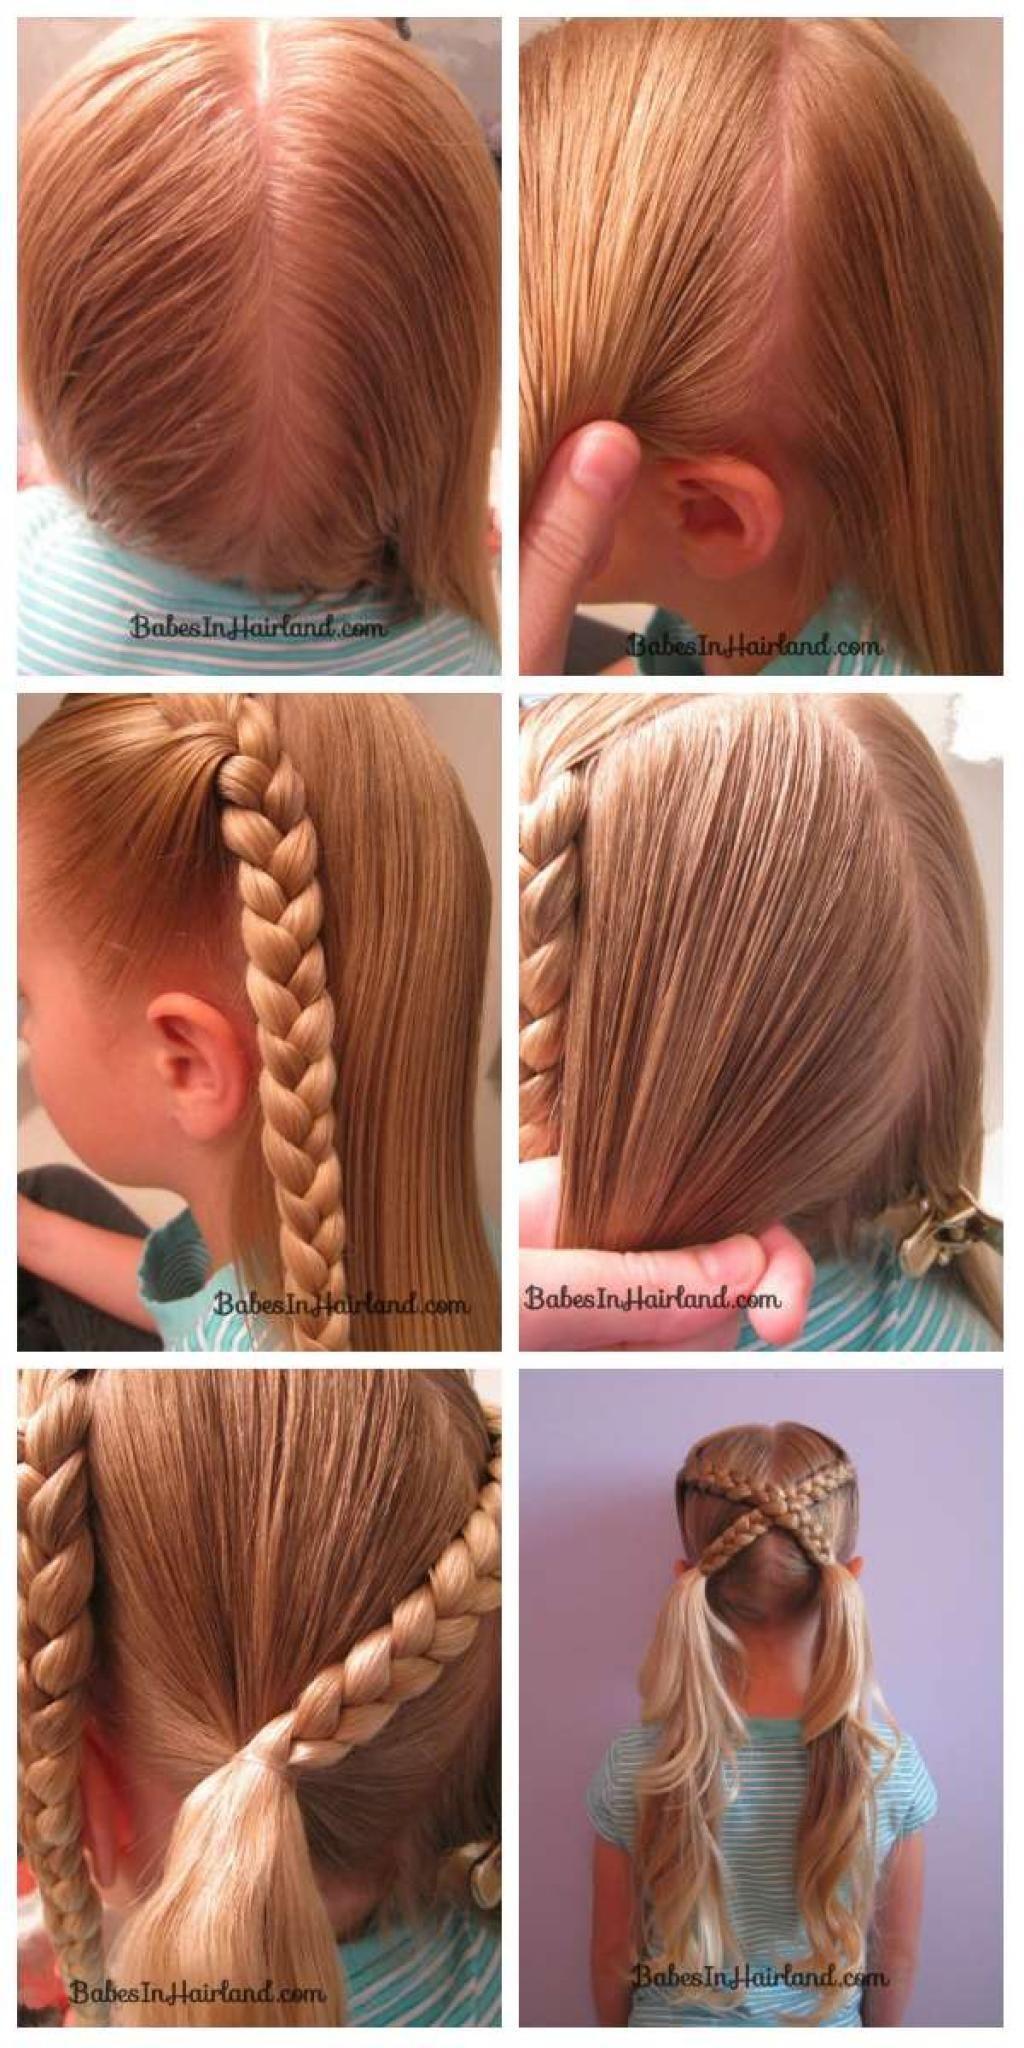 10+ Kit coiffure facile des idees